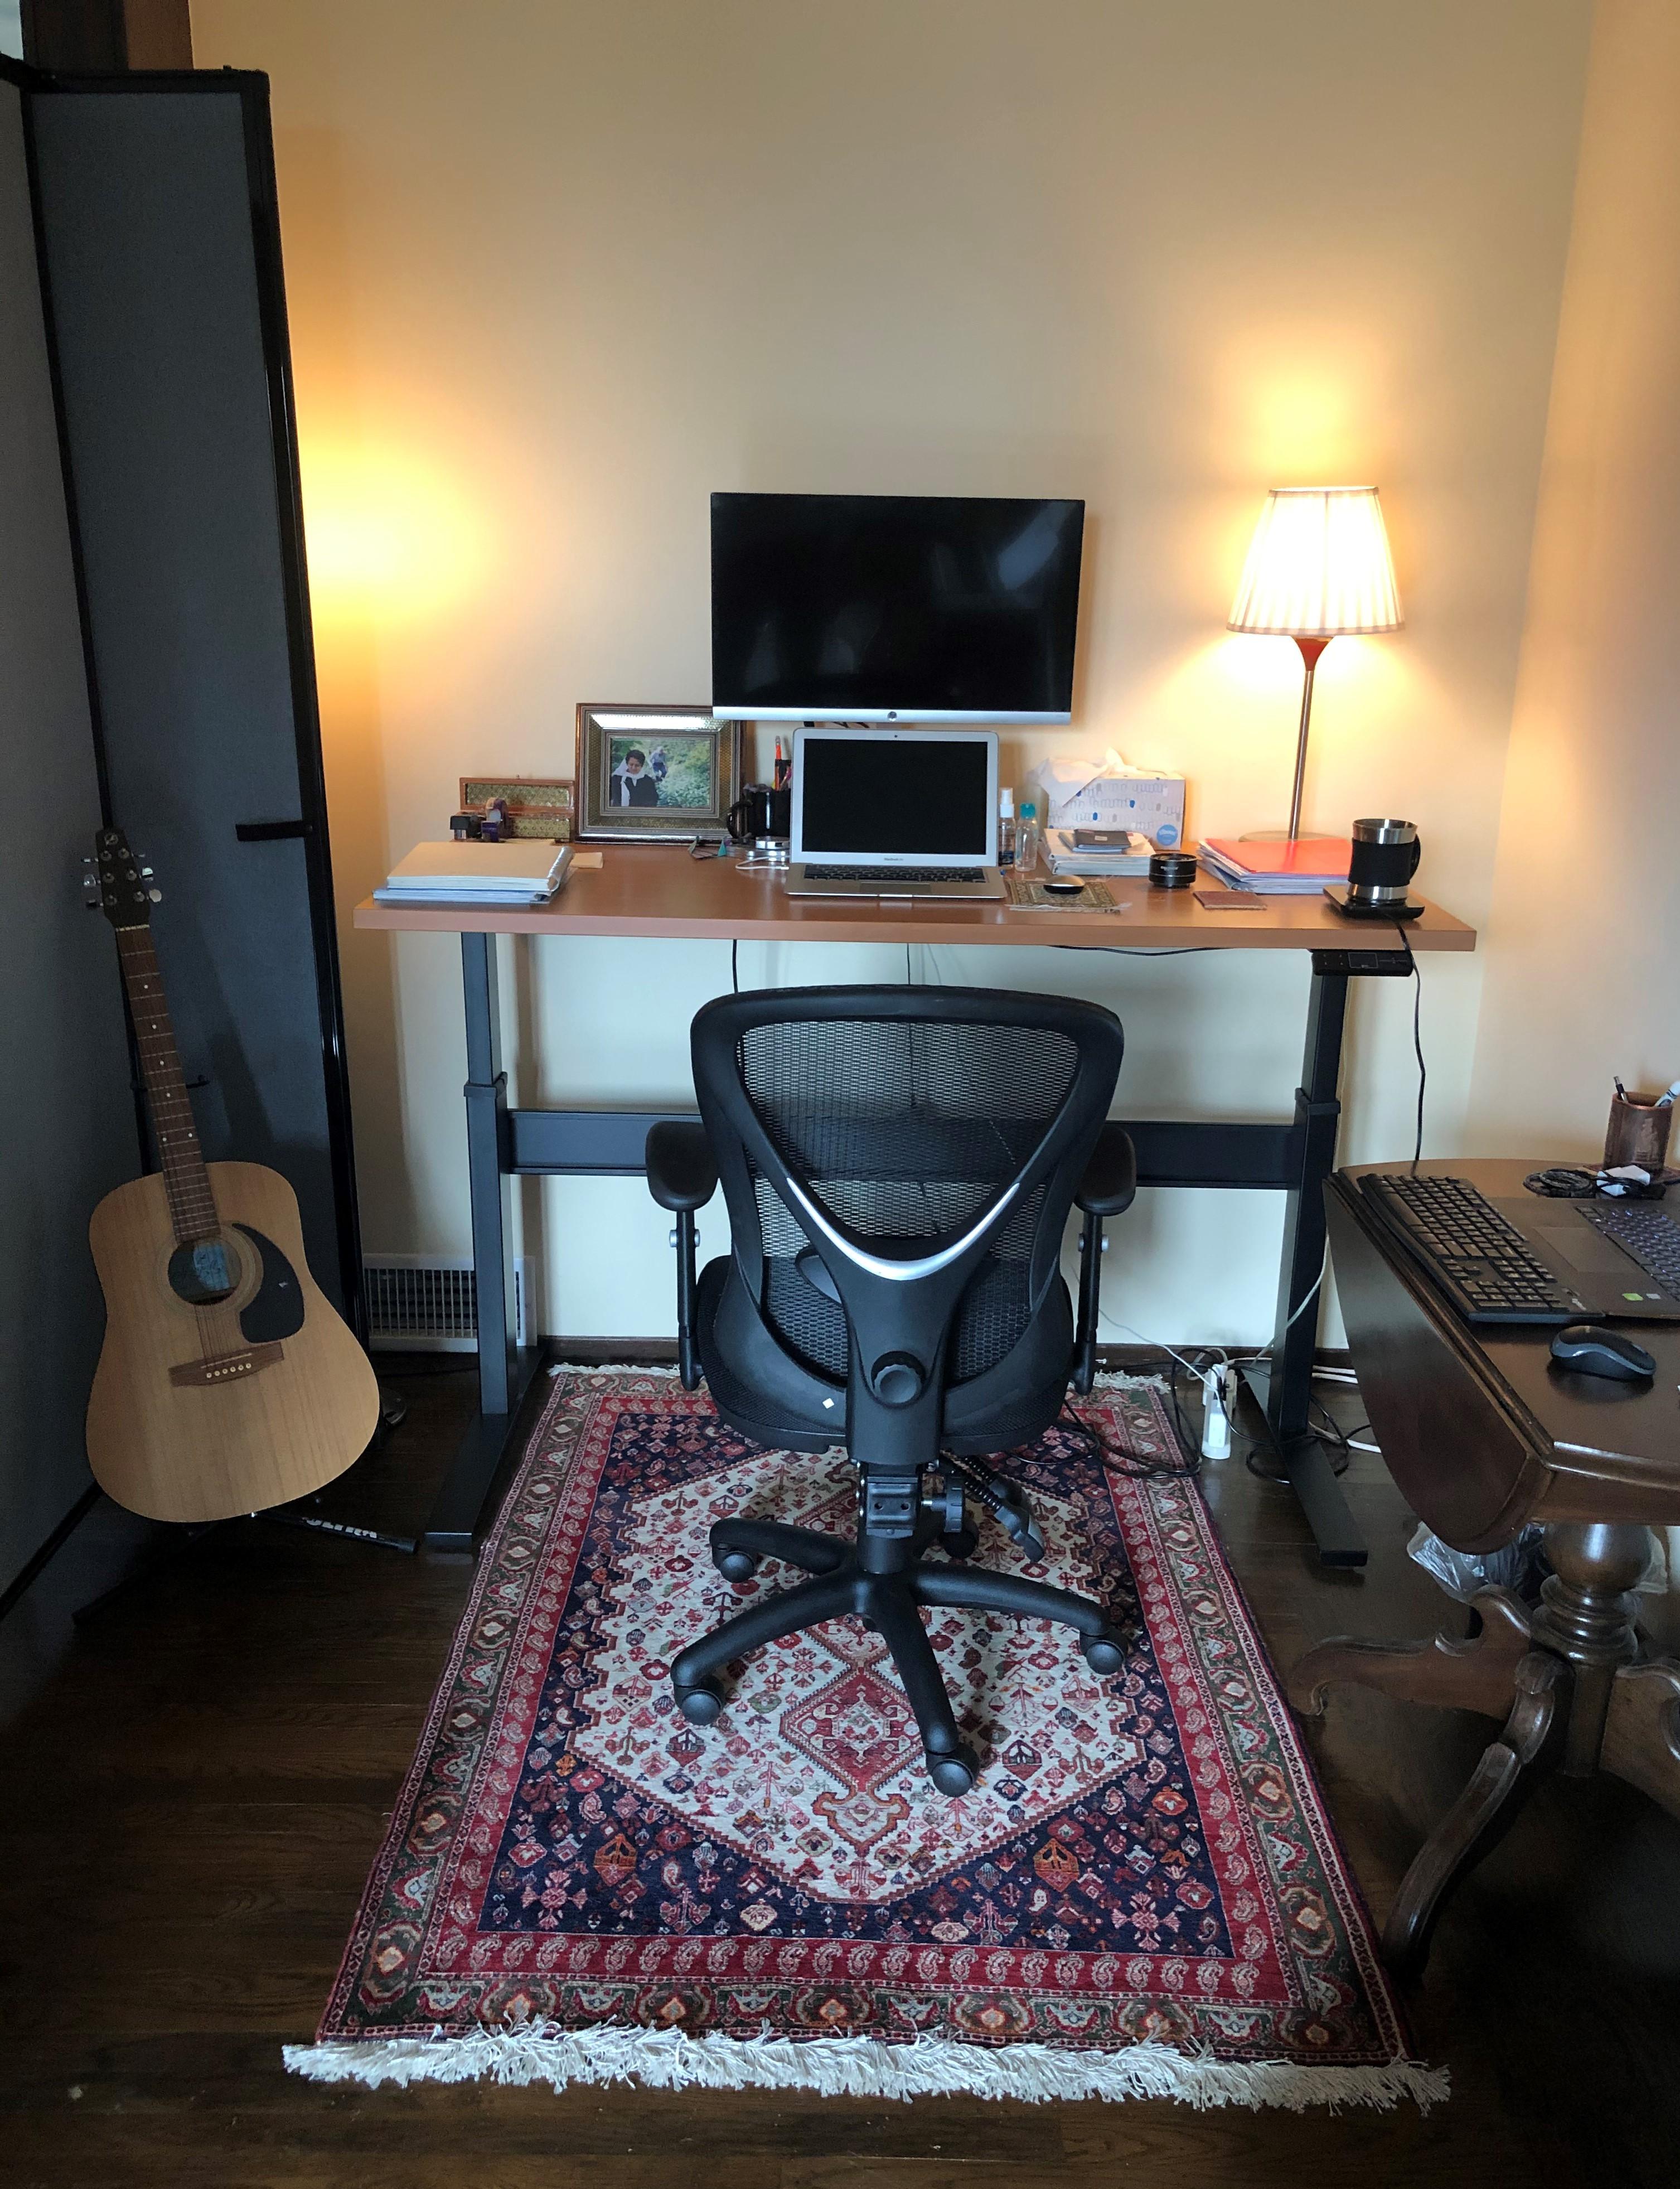 "30"" x 60"" Pearwood Laminate Top with Black VertDesk Stand Up Desk Frame"